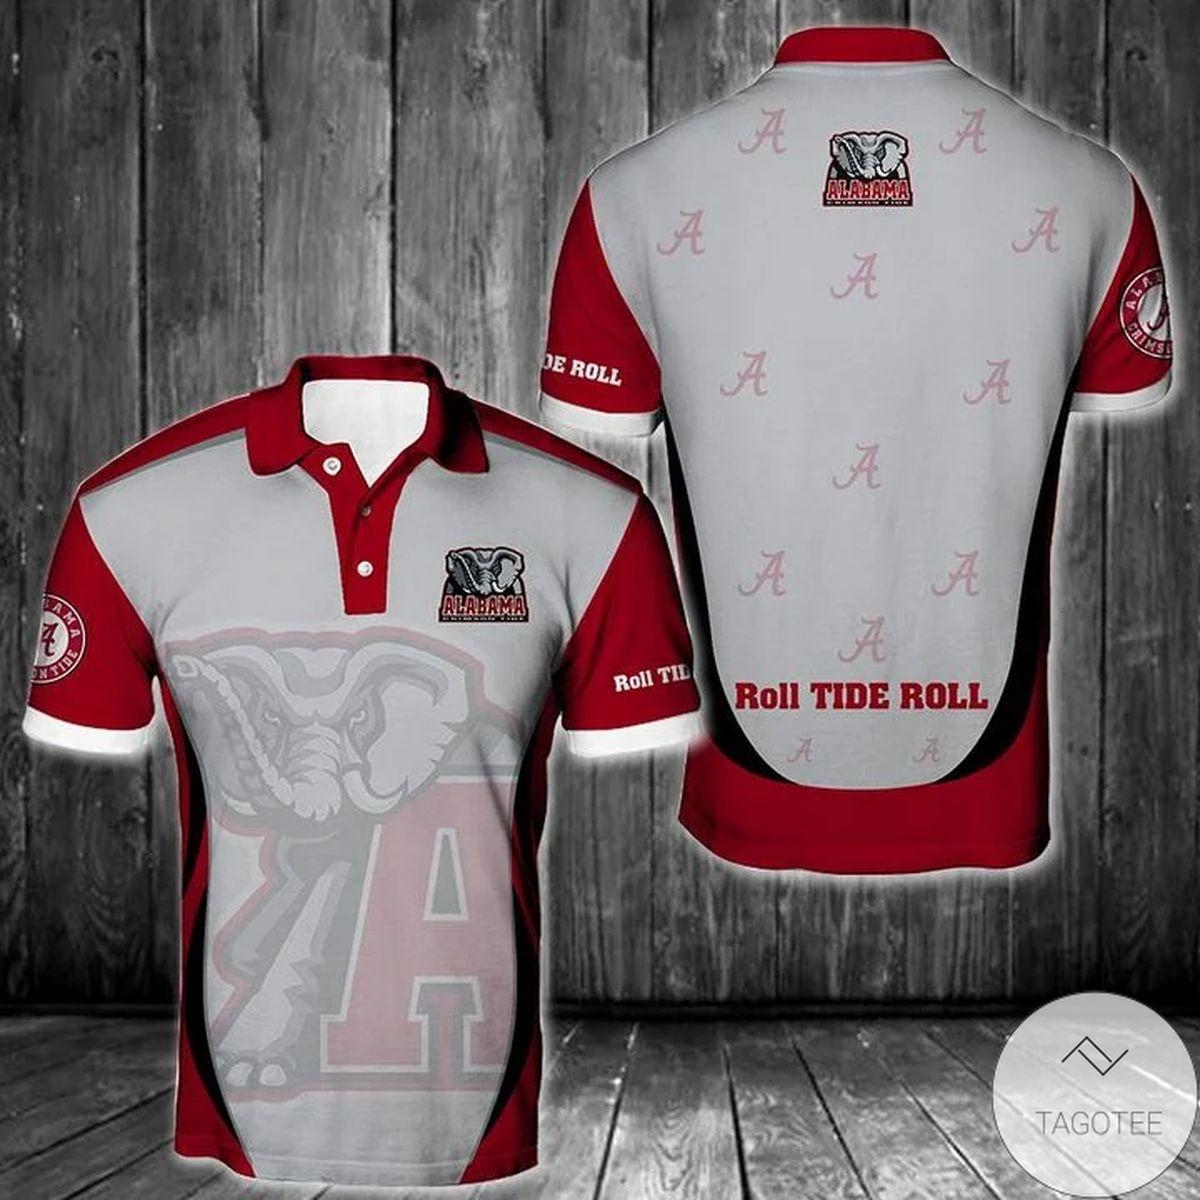 Ncaa Alabama Crimson Tide Polo Shirt